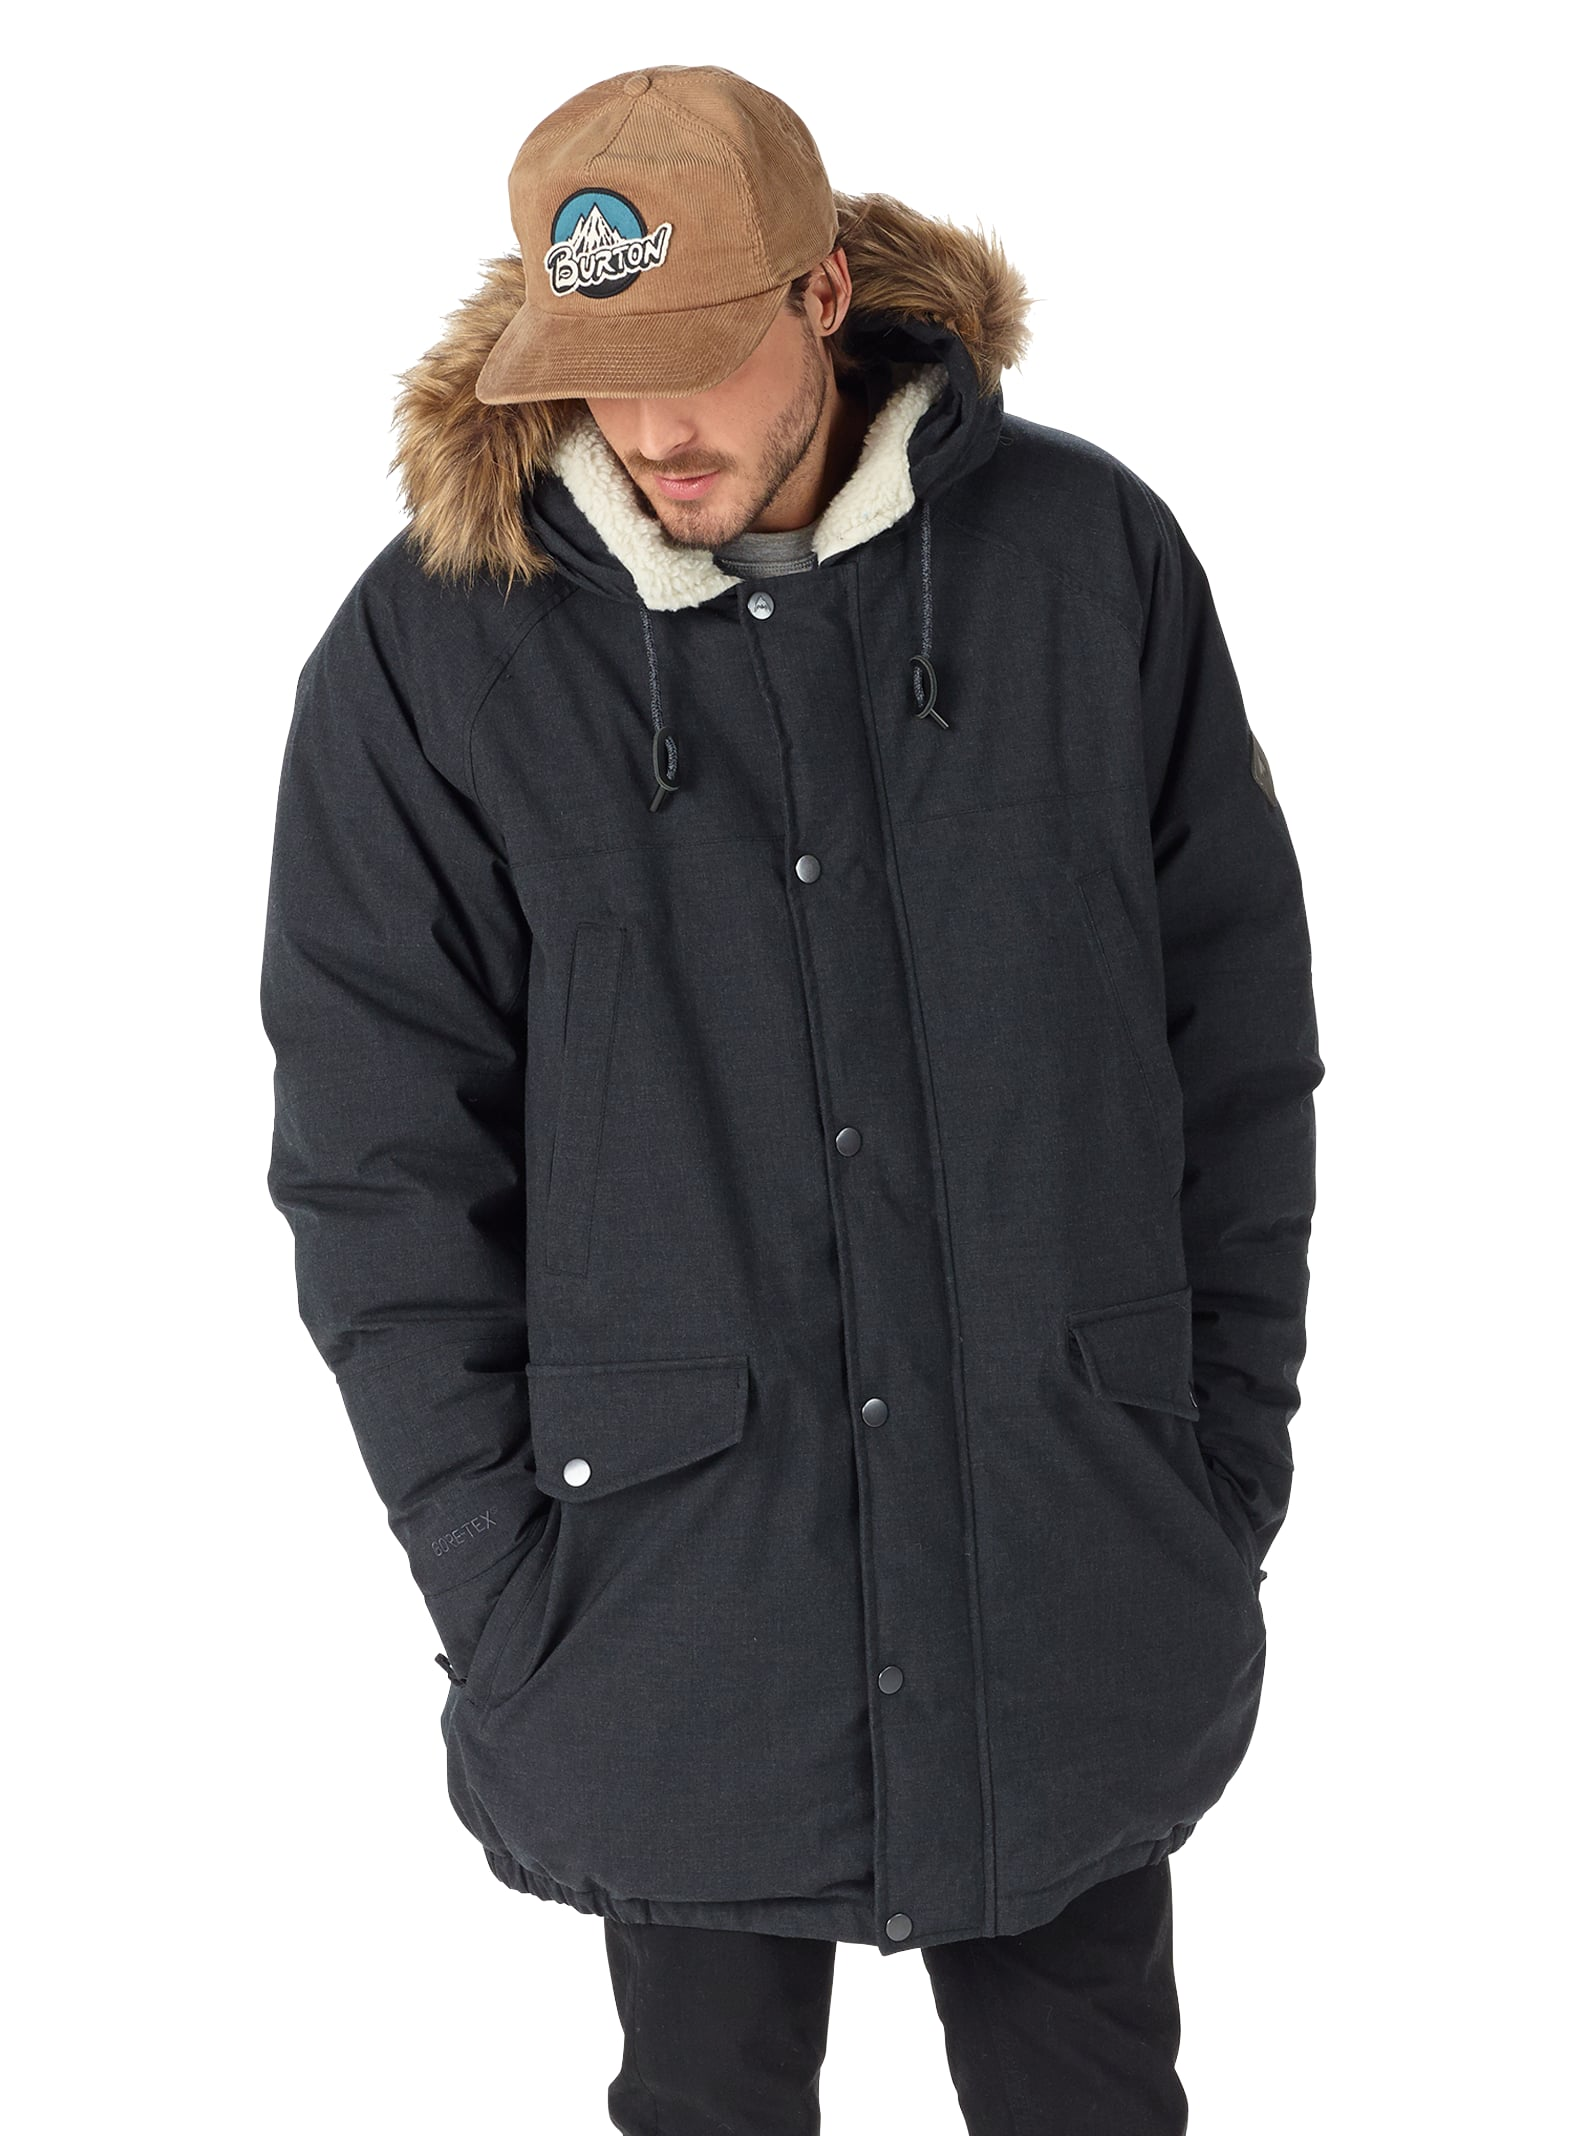 Burton mb encore insulated jacket men's